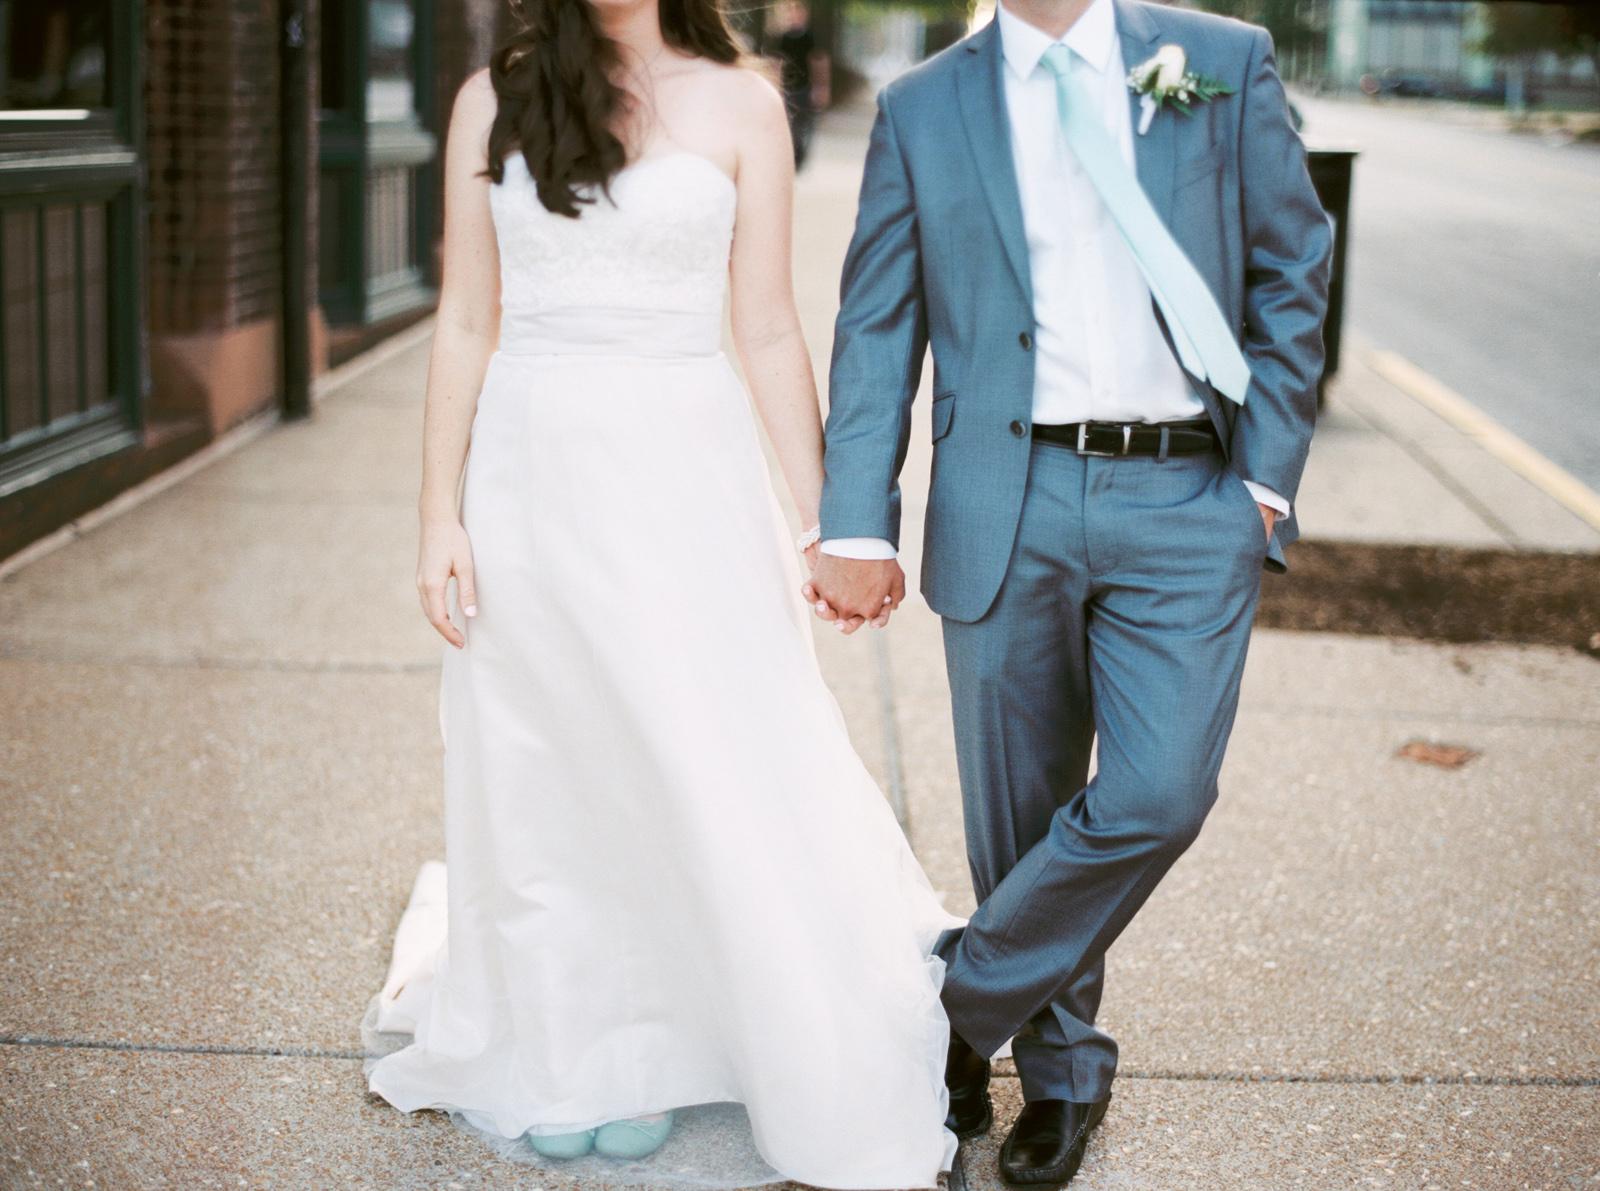 Oldani-Photography-St-Louis-Film-Photographer-Schlafly-Tap-Room-Wedding-Reception8603_17.jpg